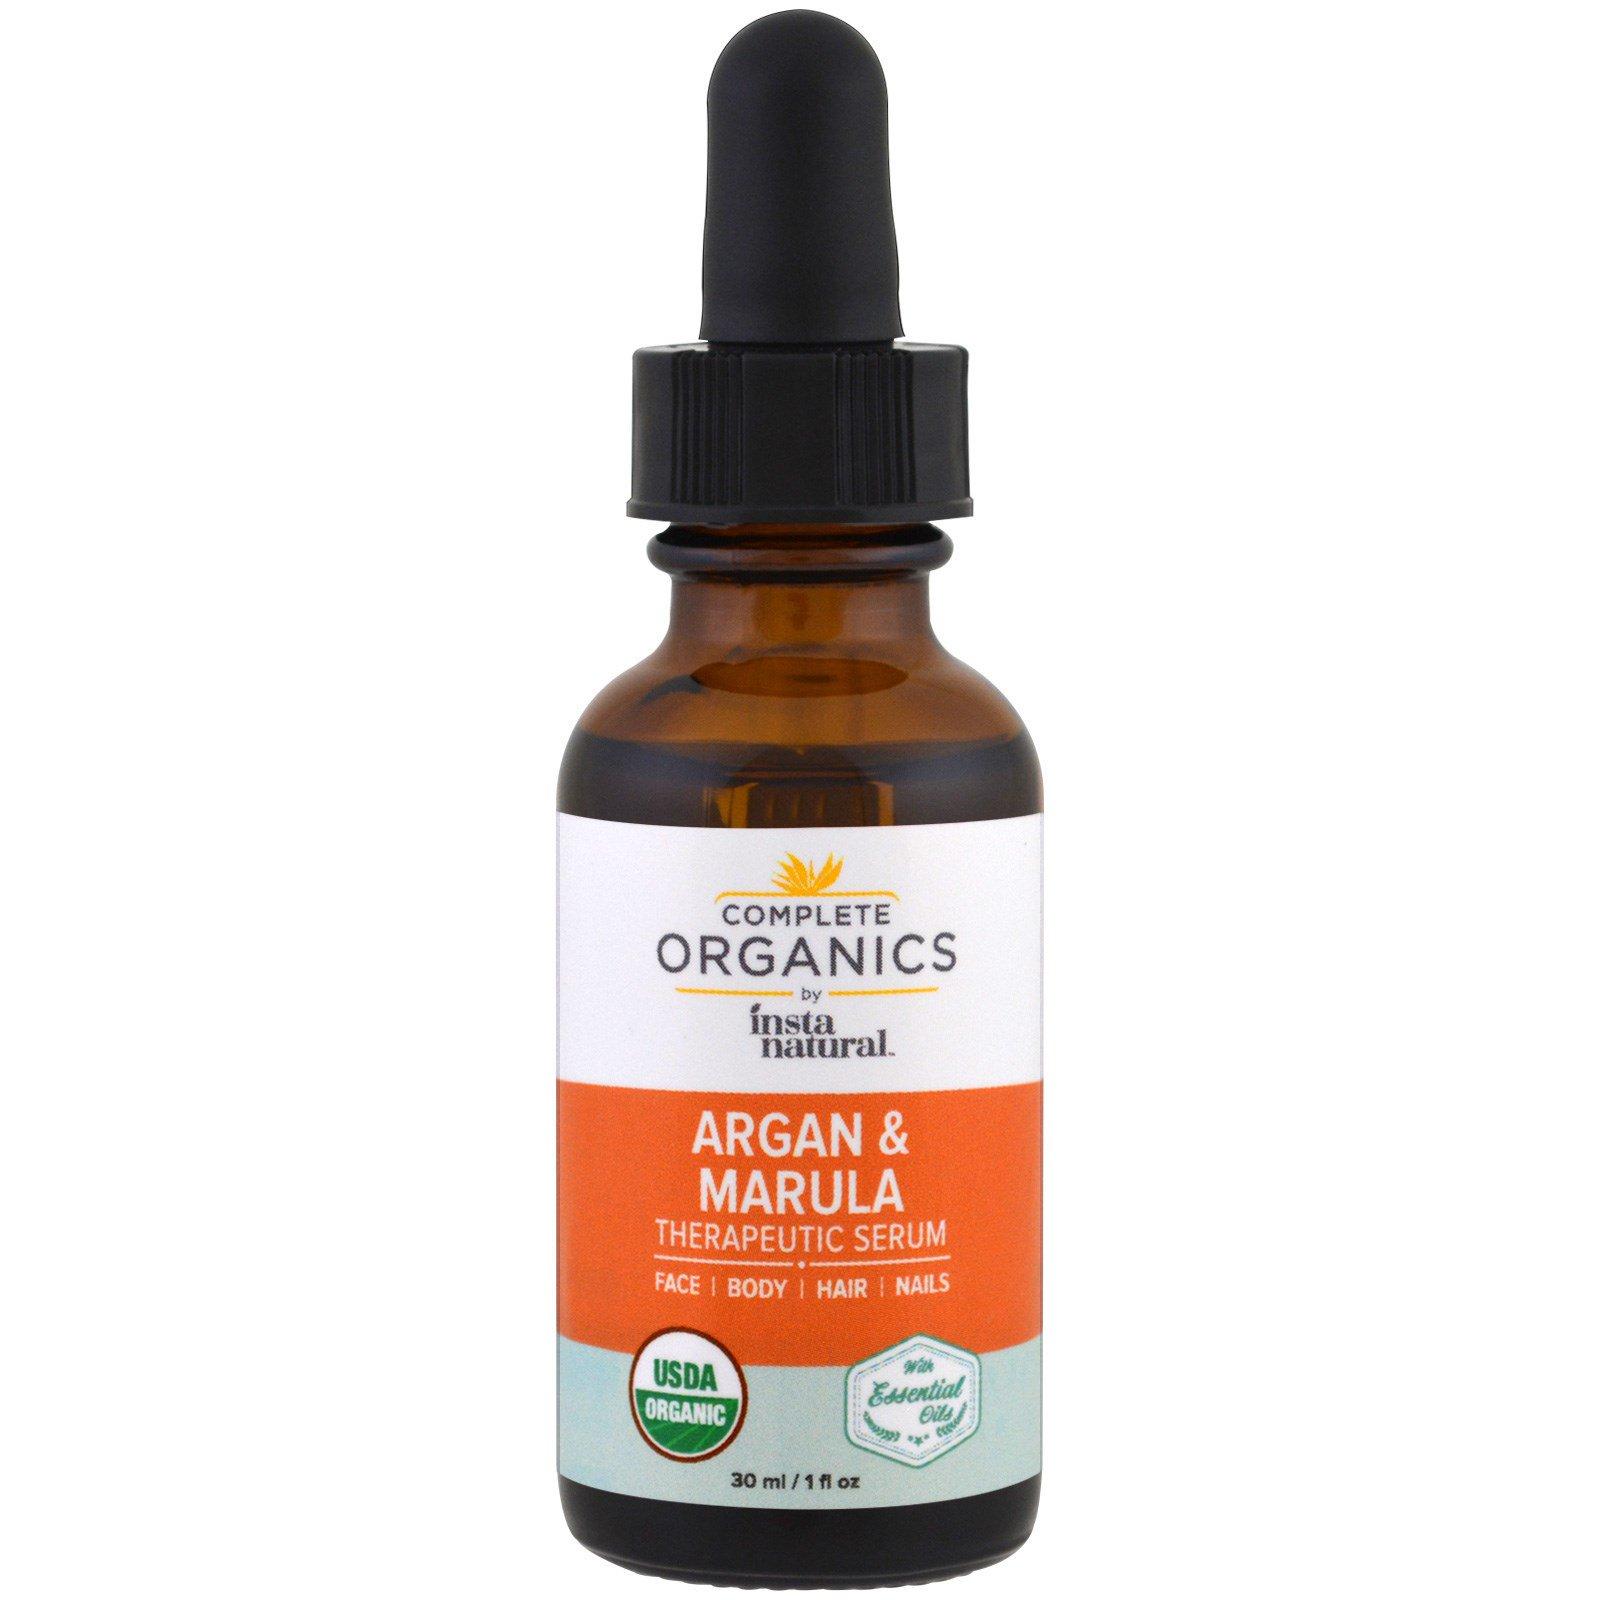 InstaNatural, Complete Organics, Therapeutic Serum, Argan Marula Oil, 1 fl oz (30 ml)